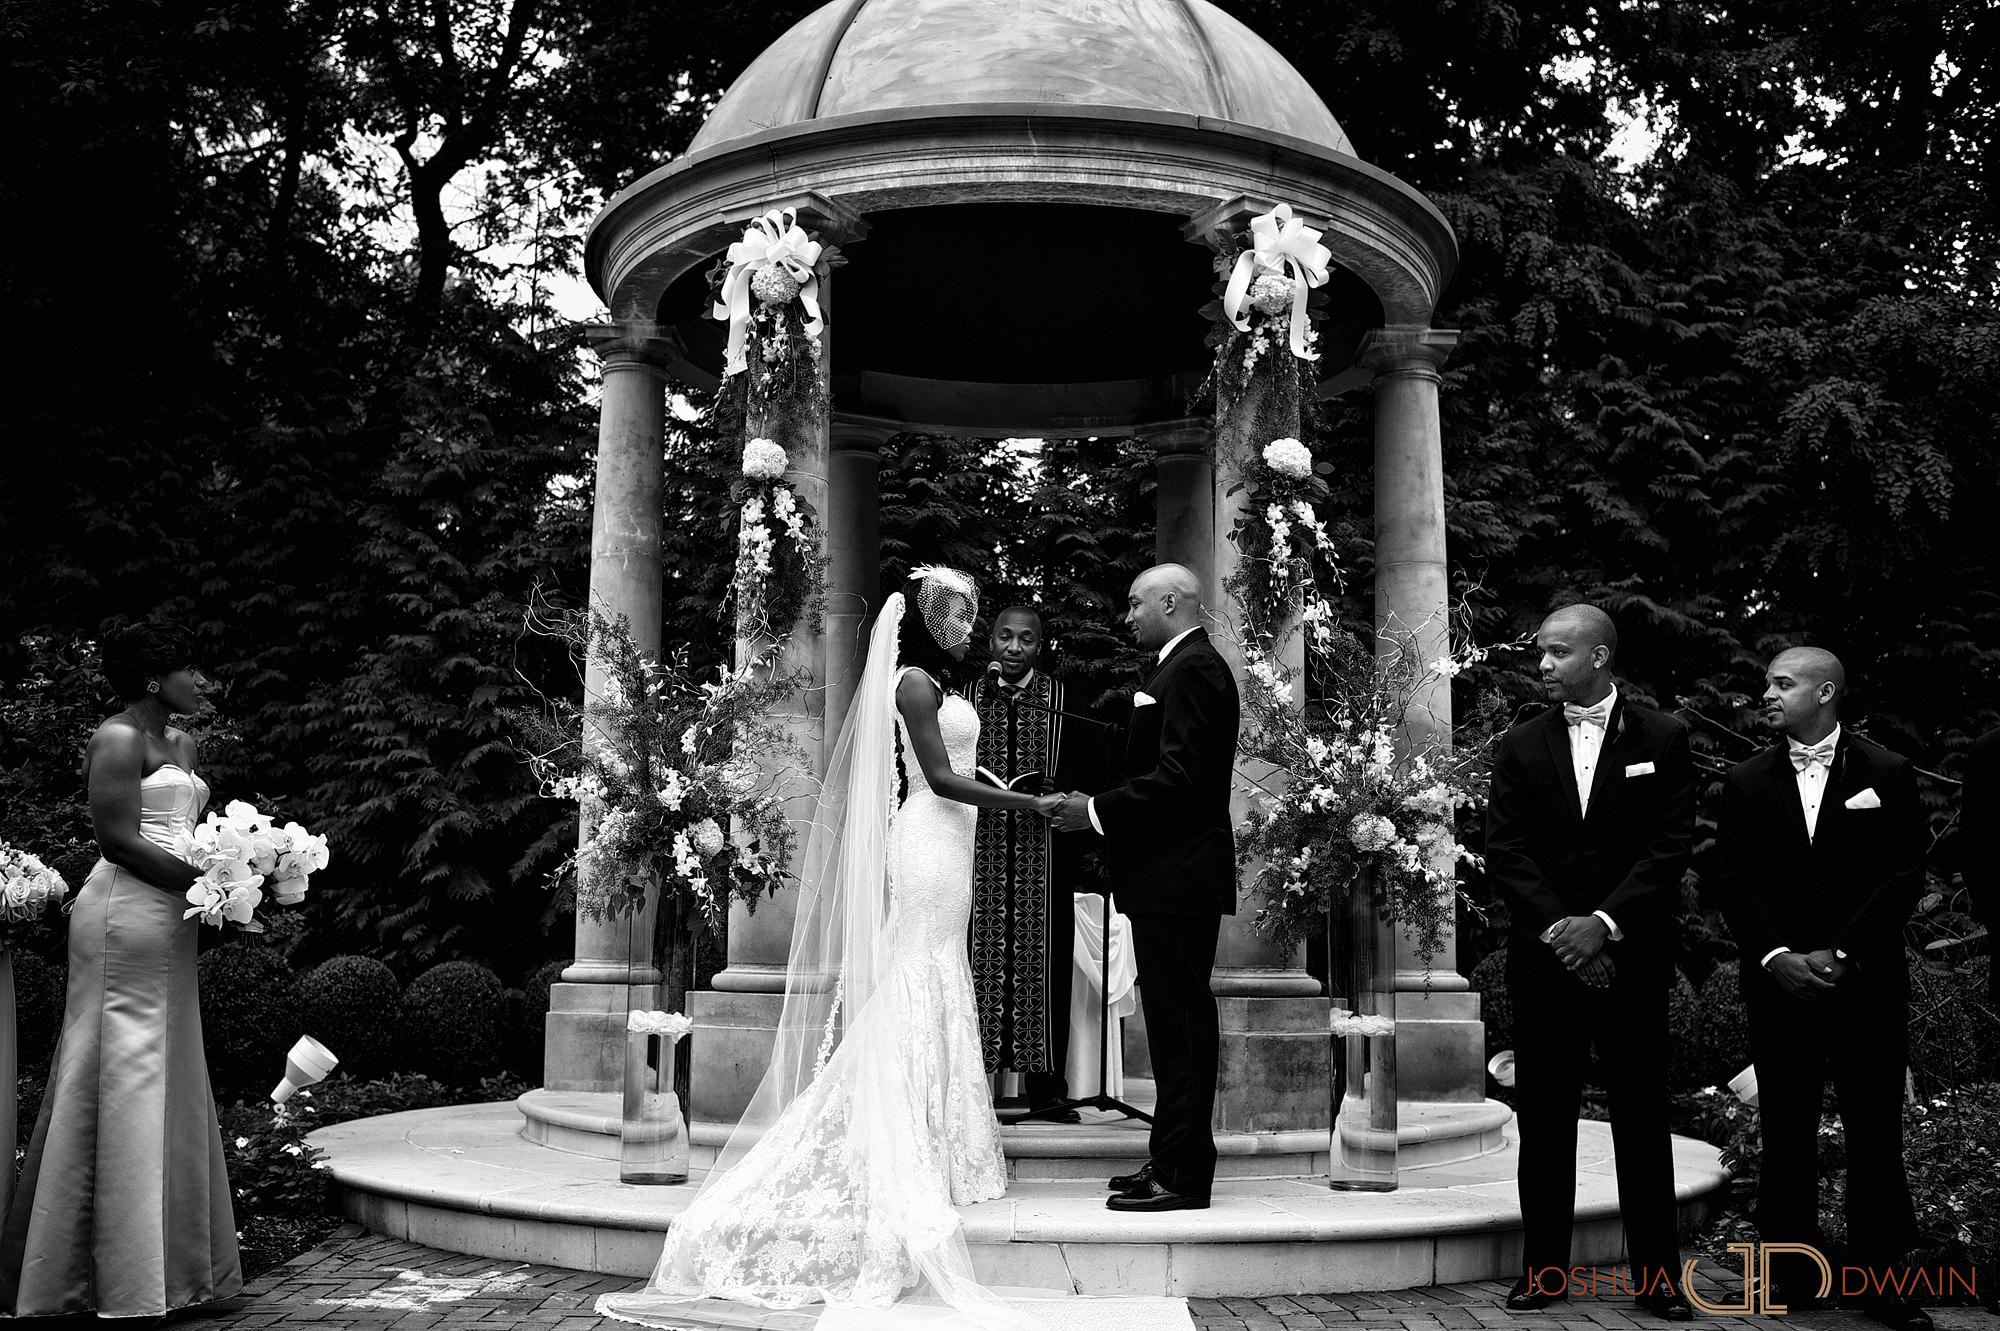 Ebone & Demez Wedding at Florentine Gardens in River vale, NJ